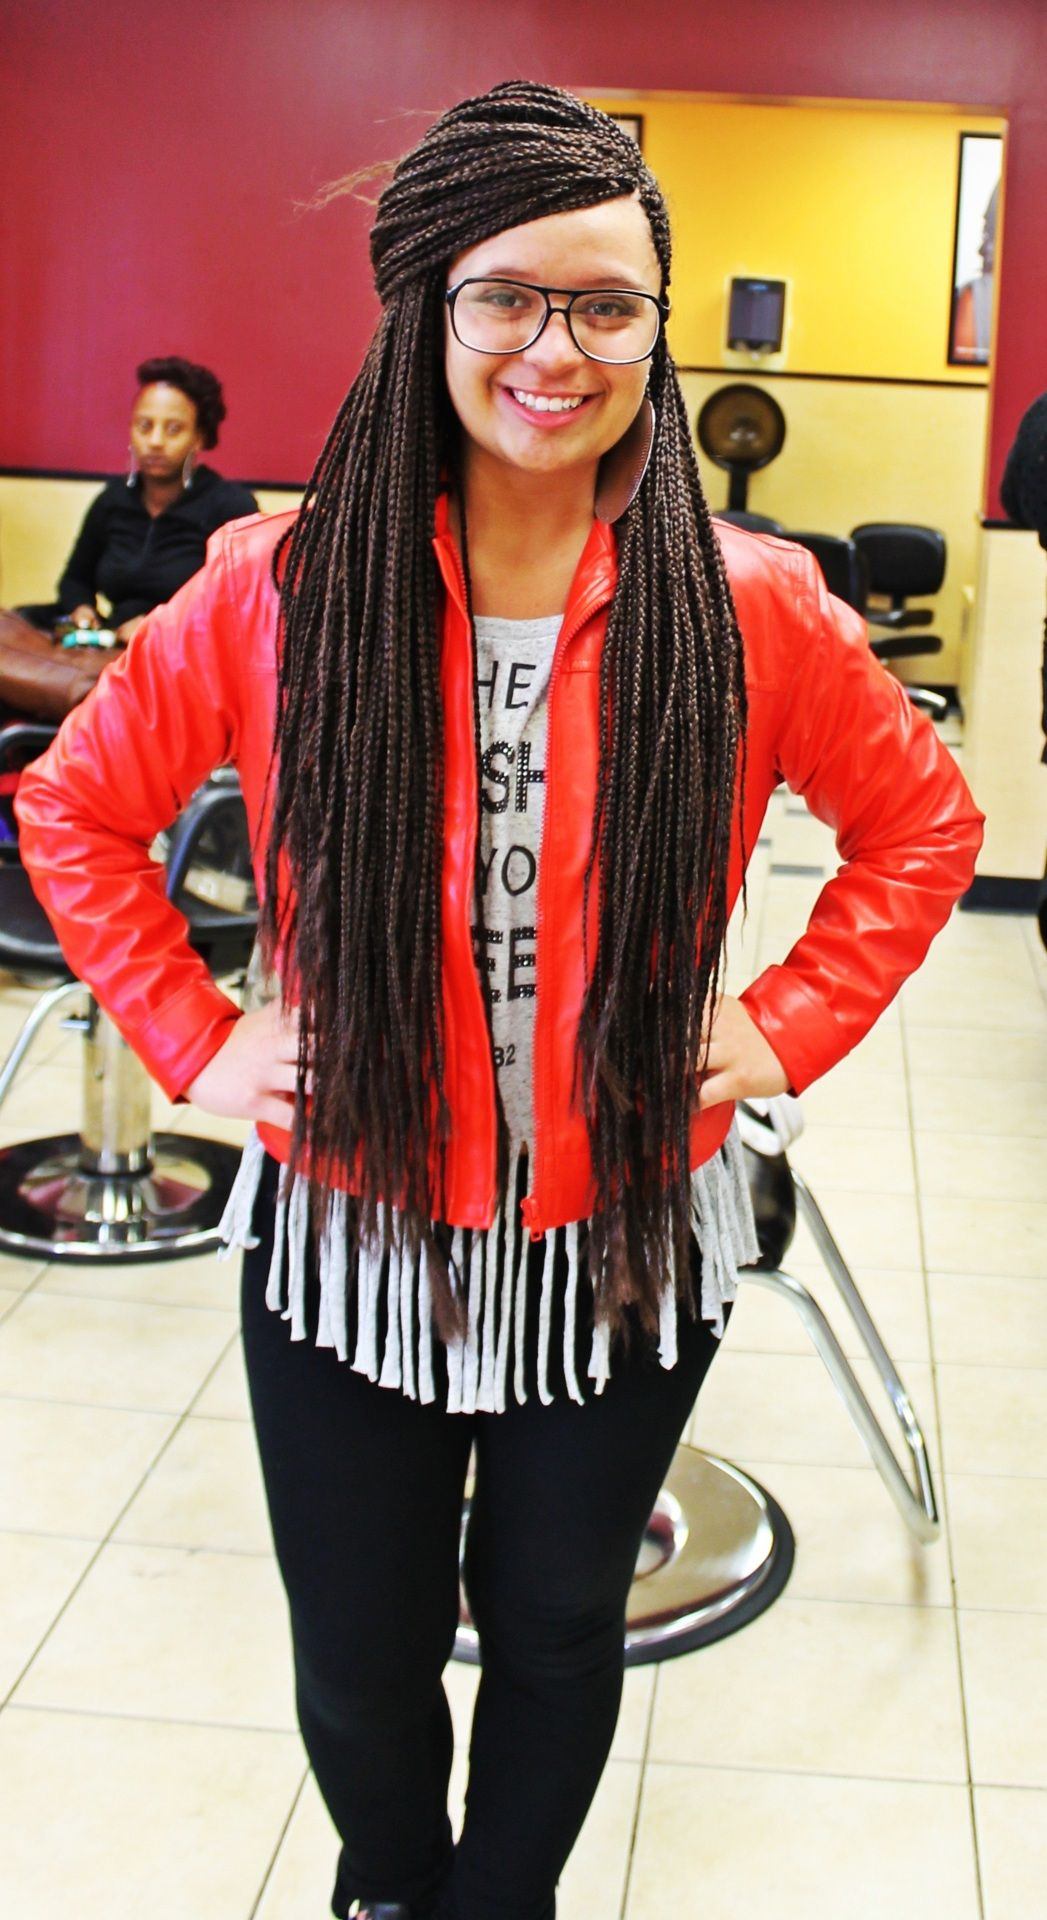 Phenomenal Latina Hairstyles Google Search Hair Pinterest Latinas Short Hairstyles For Black Women Fulllsitofus